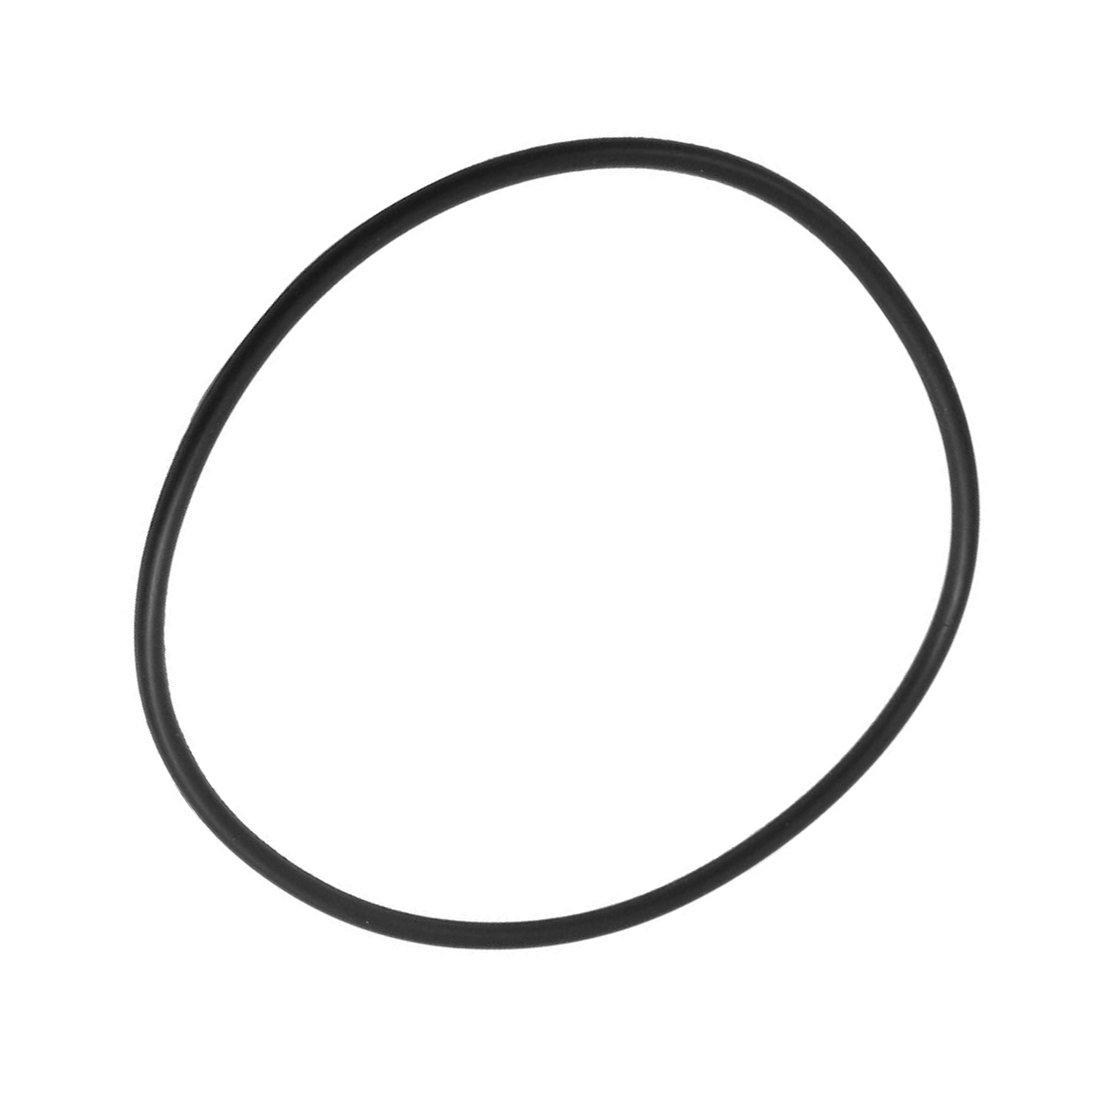 SNOWINSPRING Nitril Gummi O Typ Abdichtung Ring Dichtung oesen schwarz 150x140x5 mm